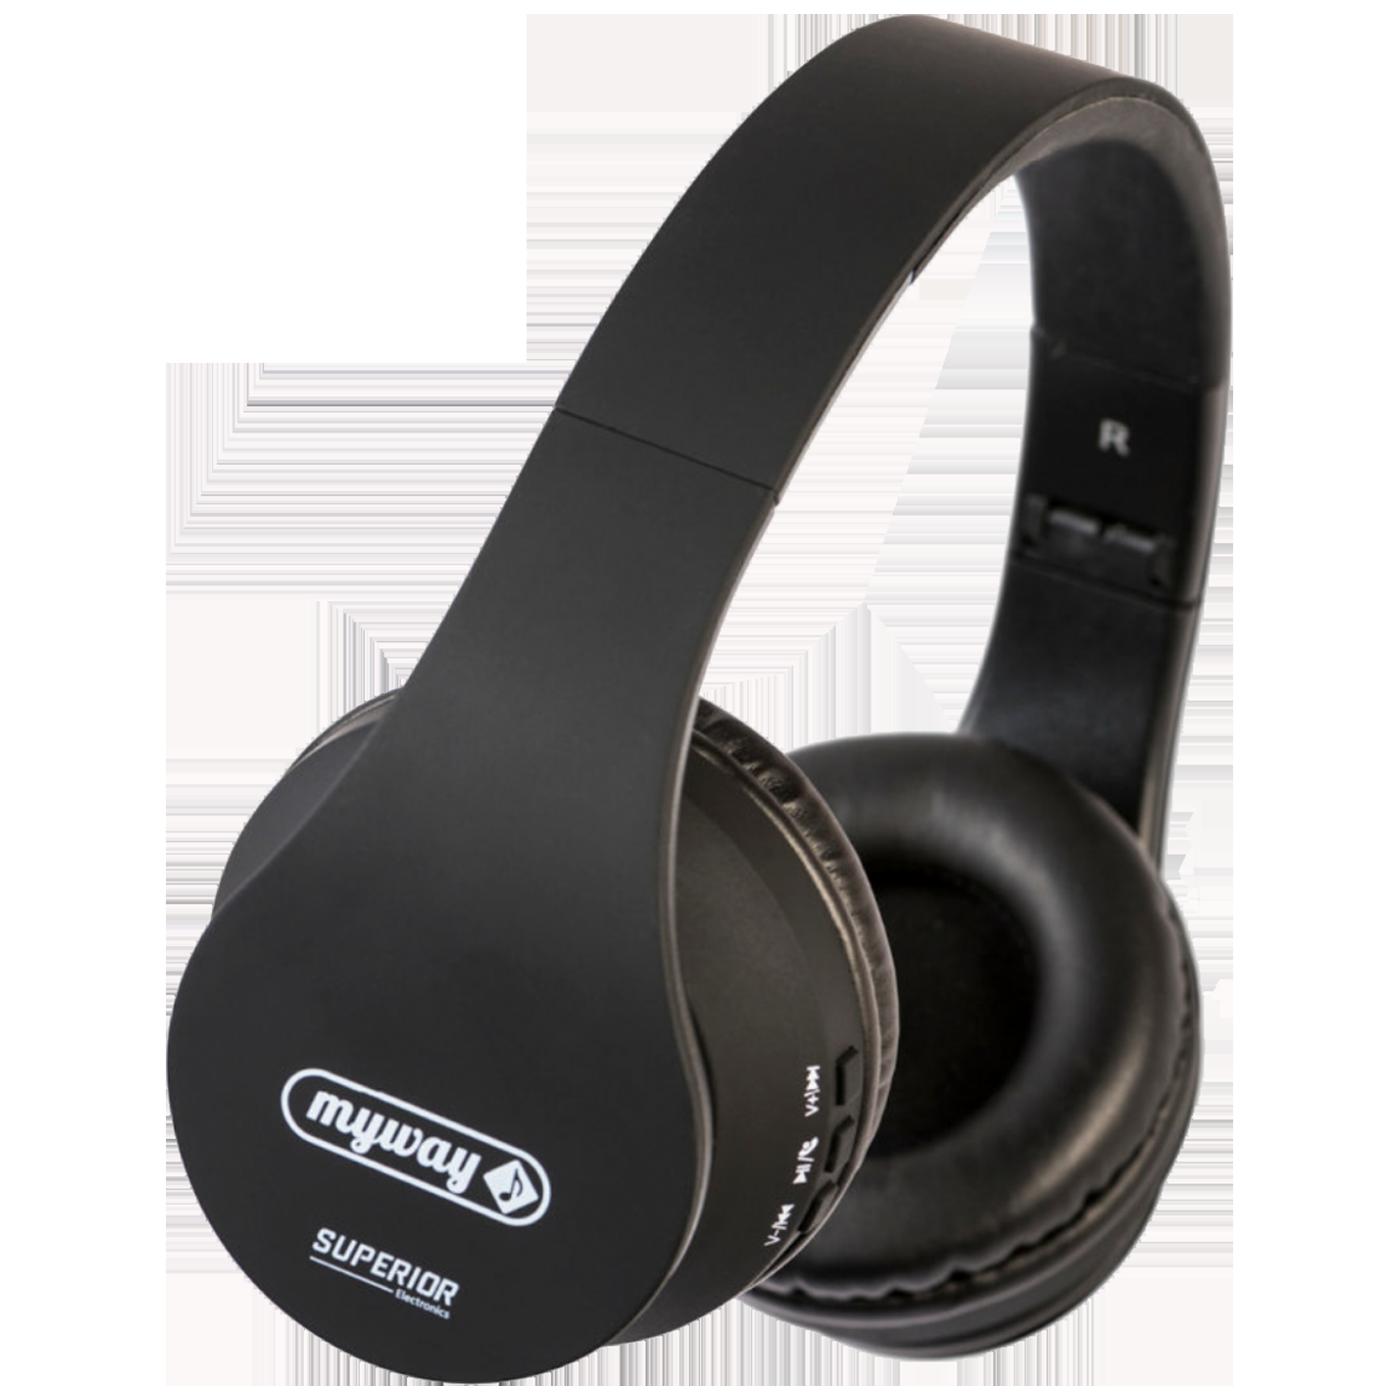 Superior - MyWay Bluetooth headphones